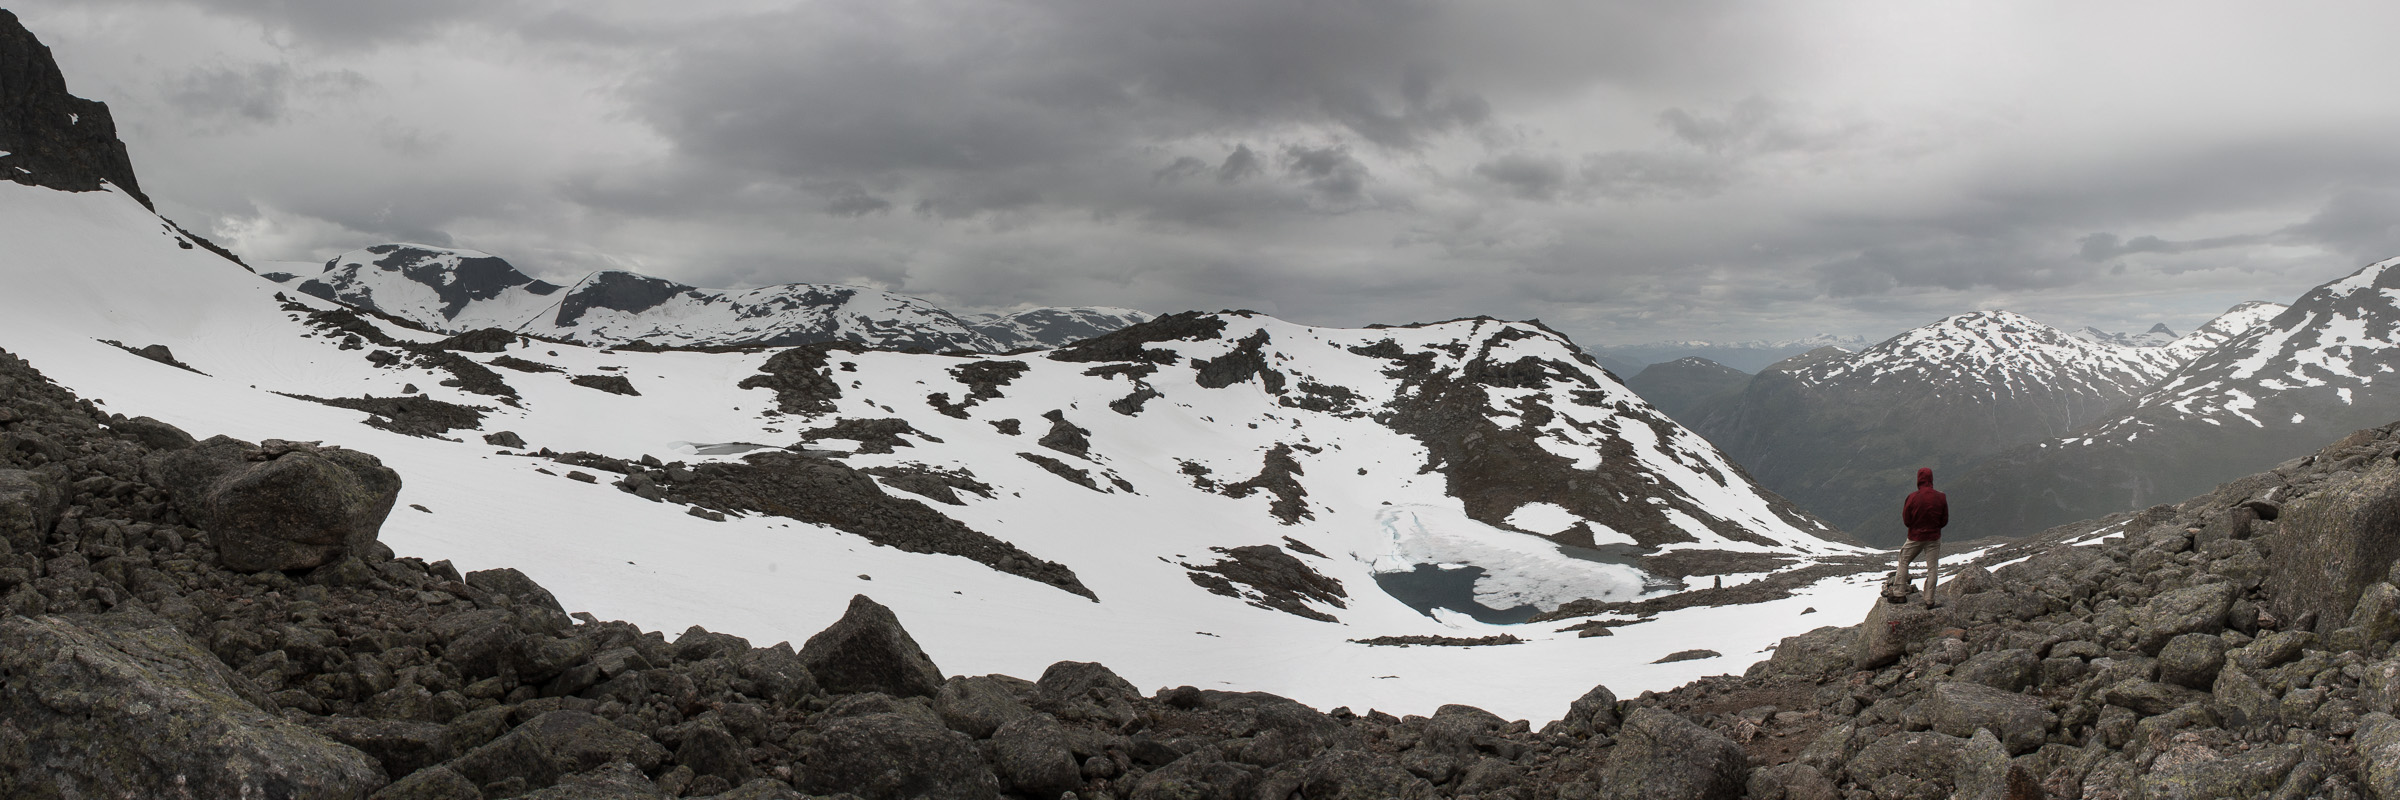 The Skala, Norway